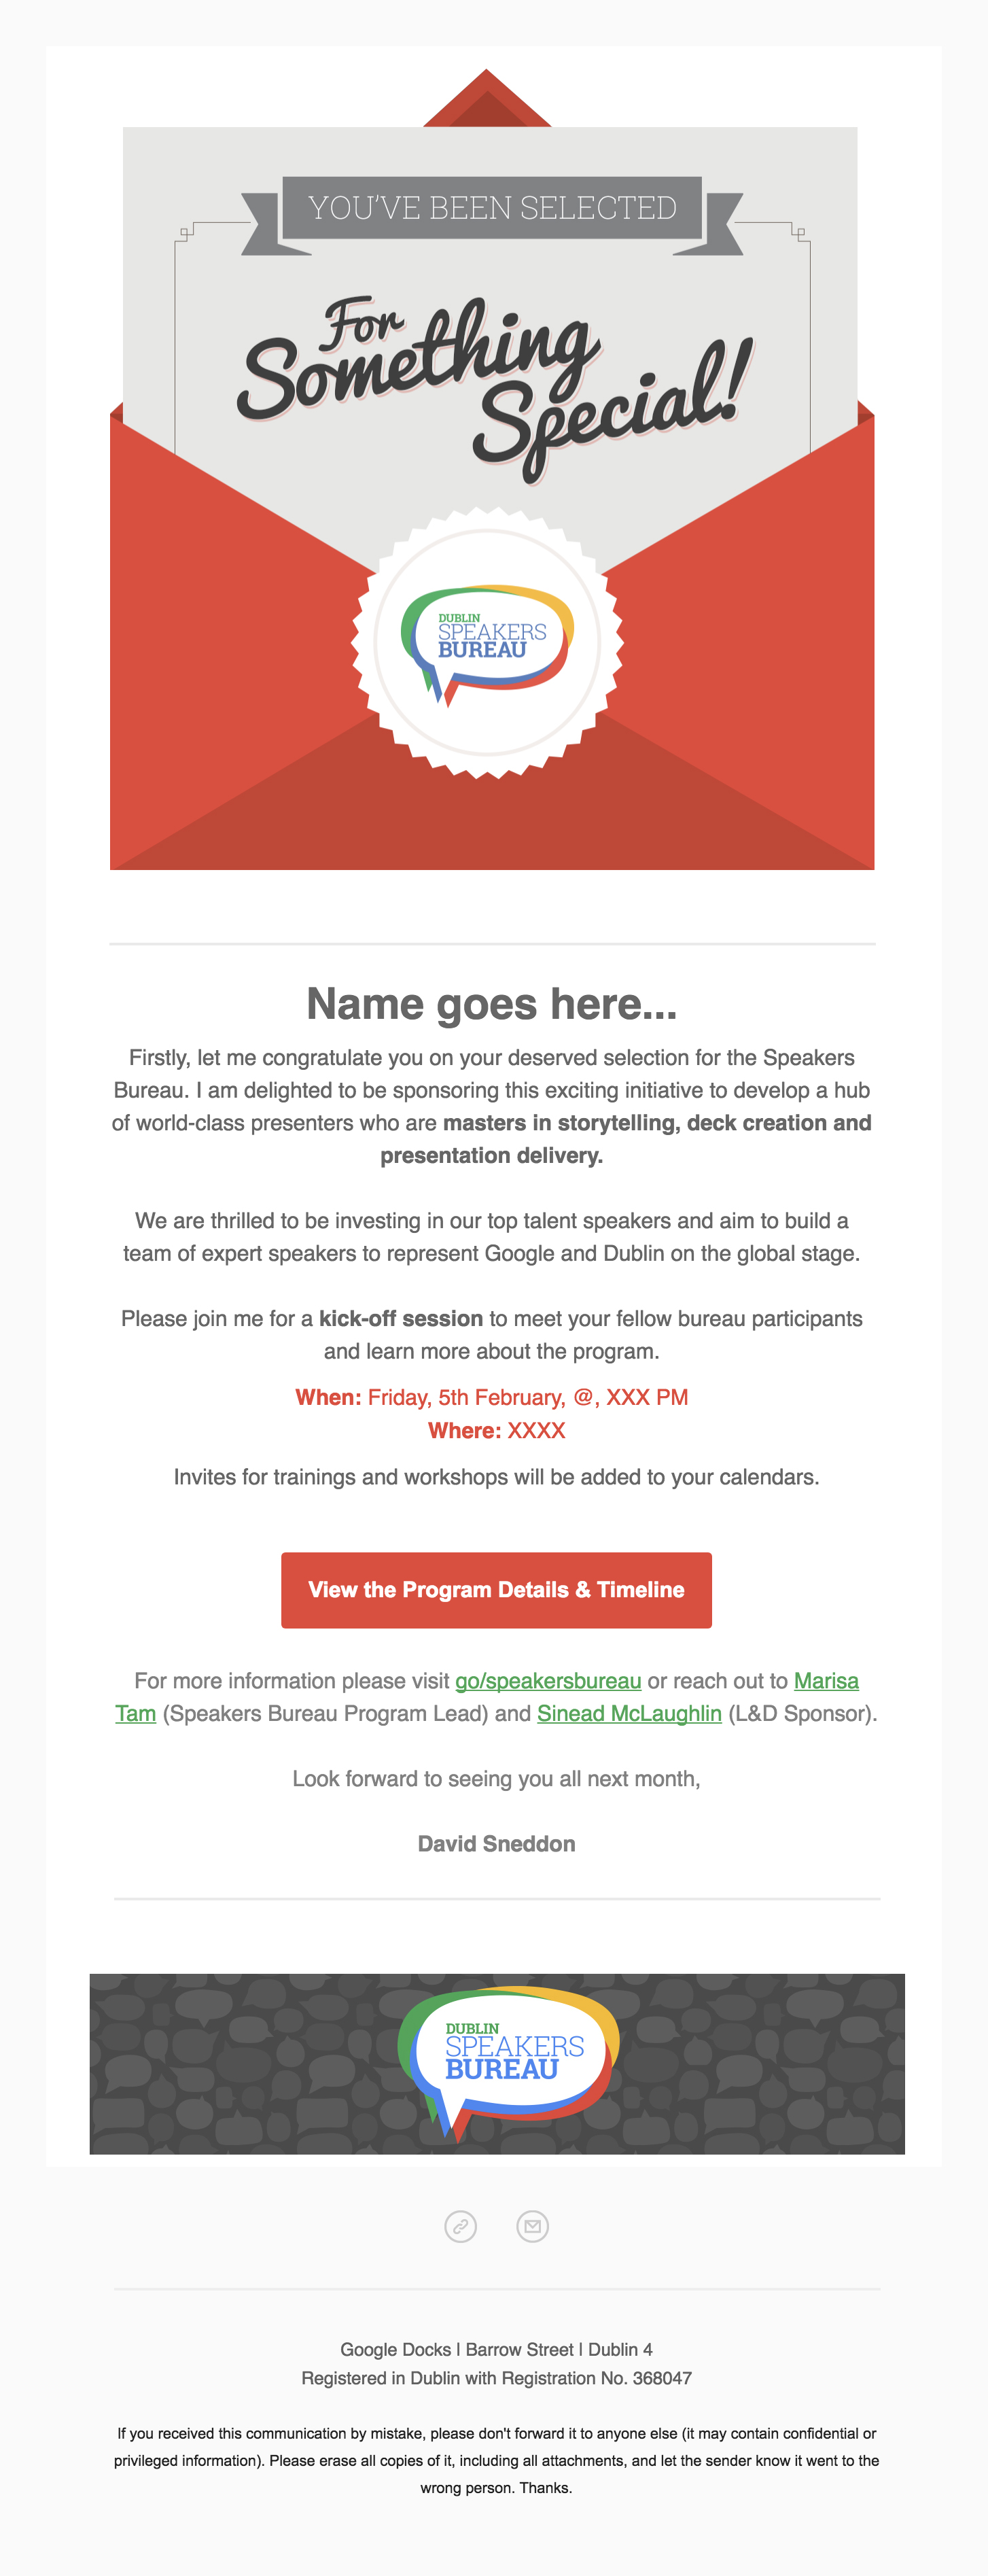 Email_Invite.jpg